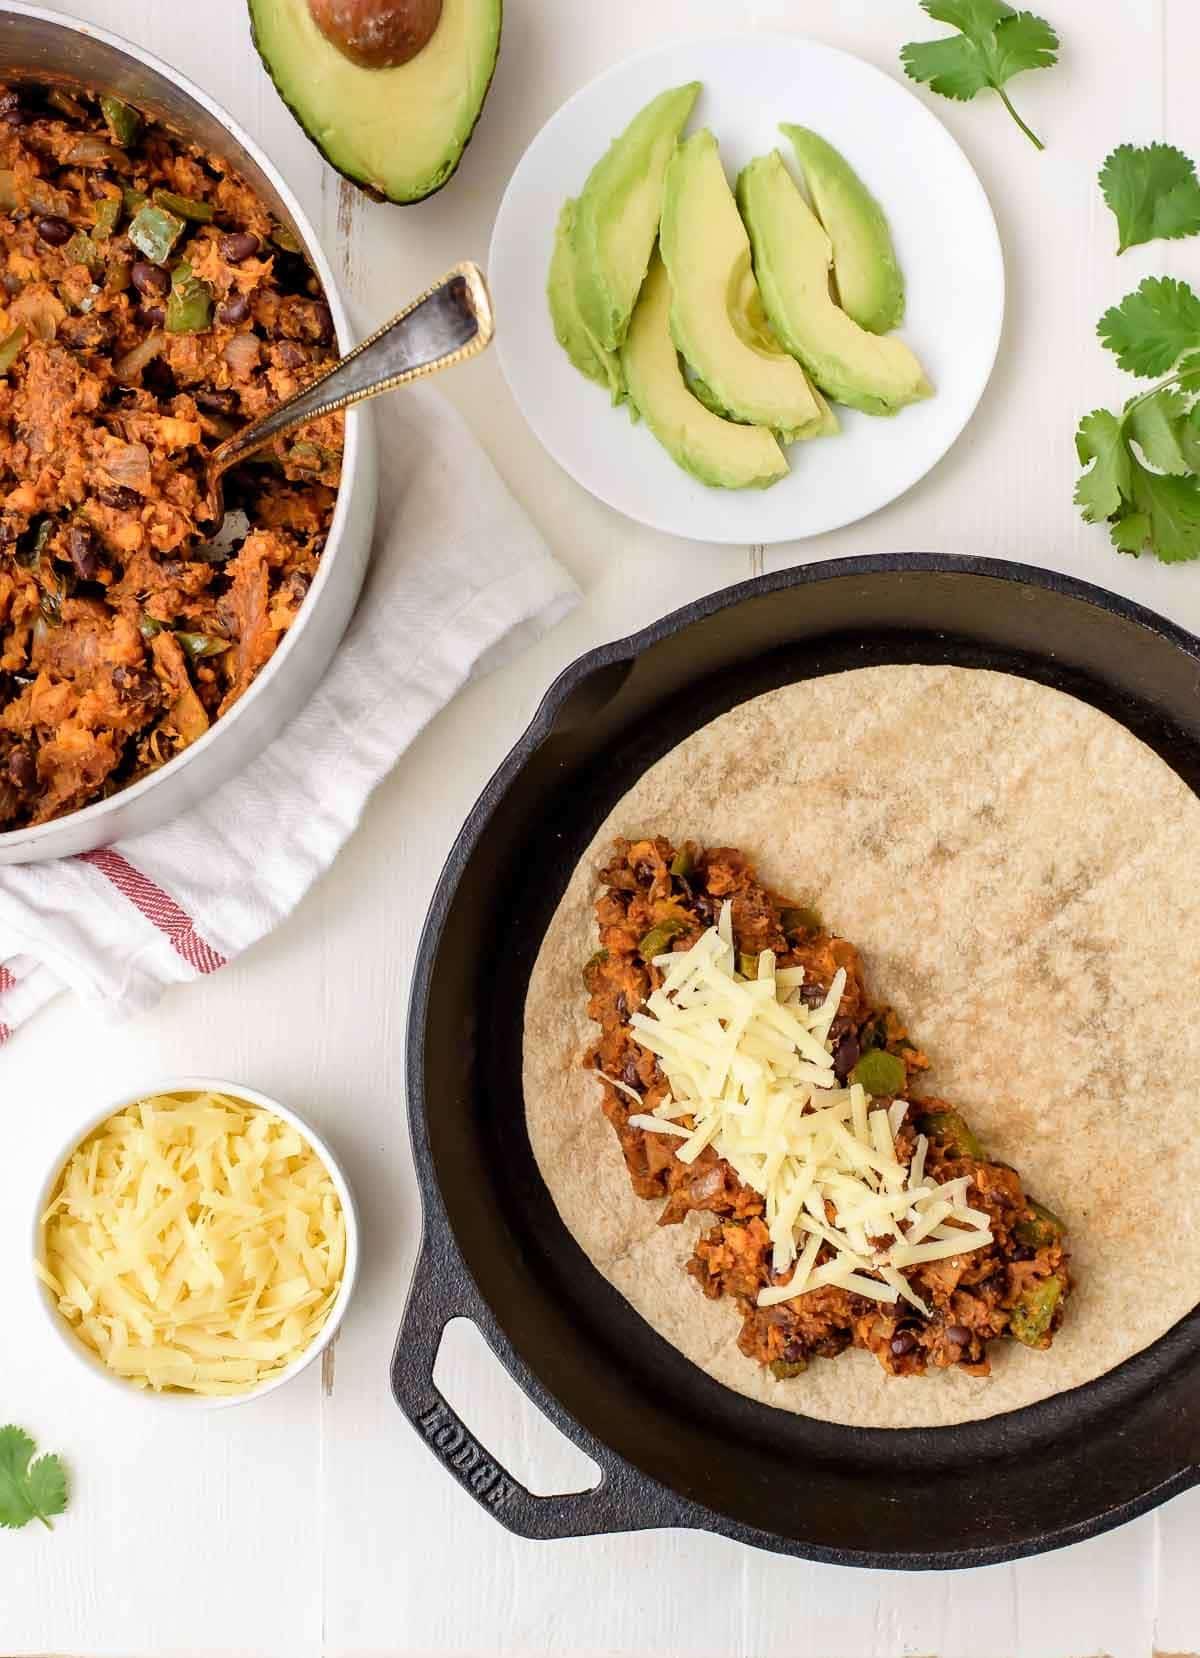 How to make Sweet Potato Black Bean Quesadillas